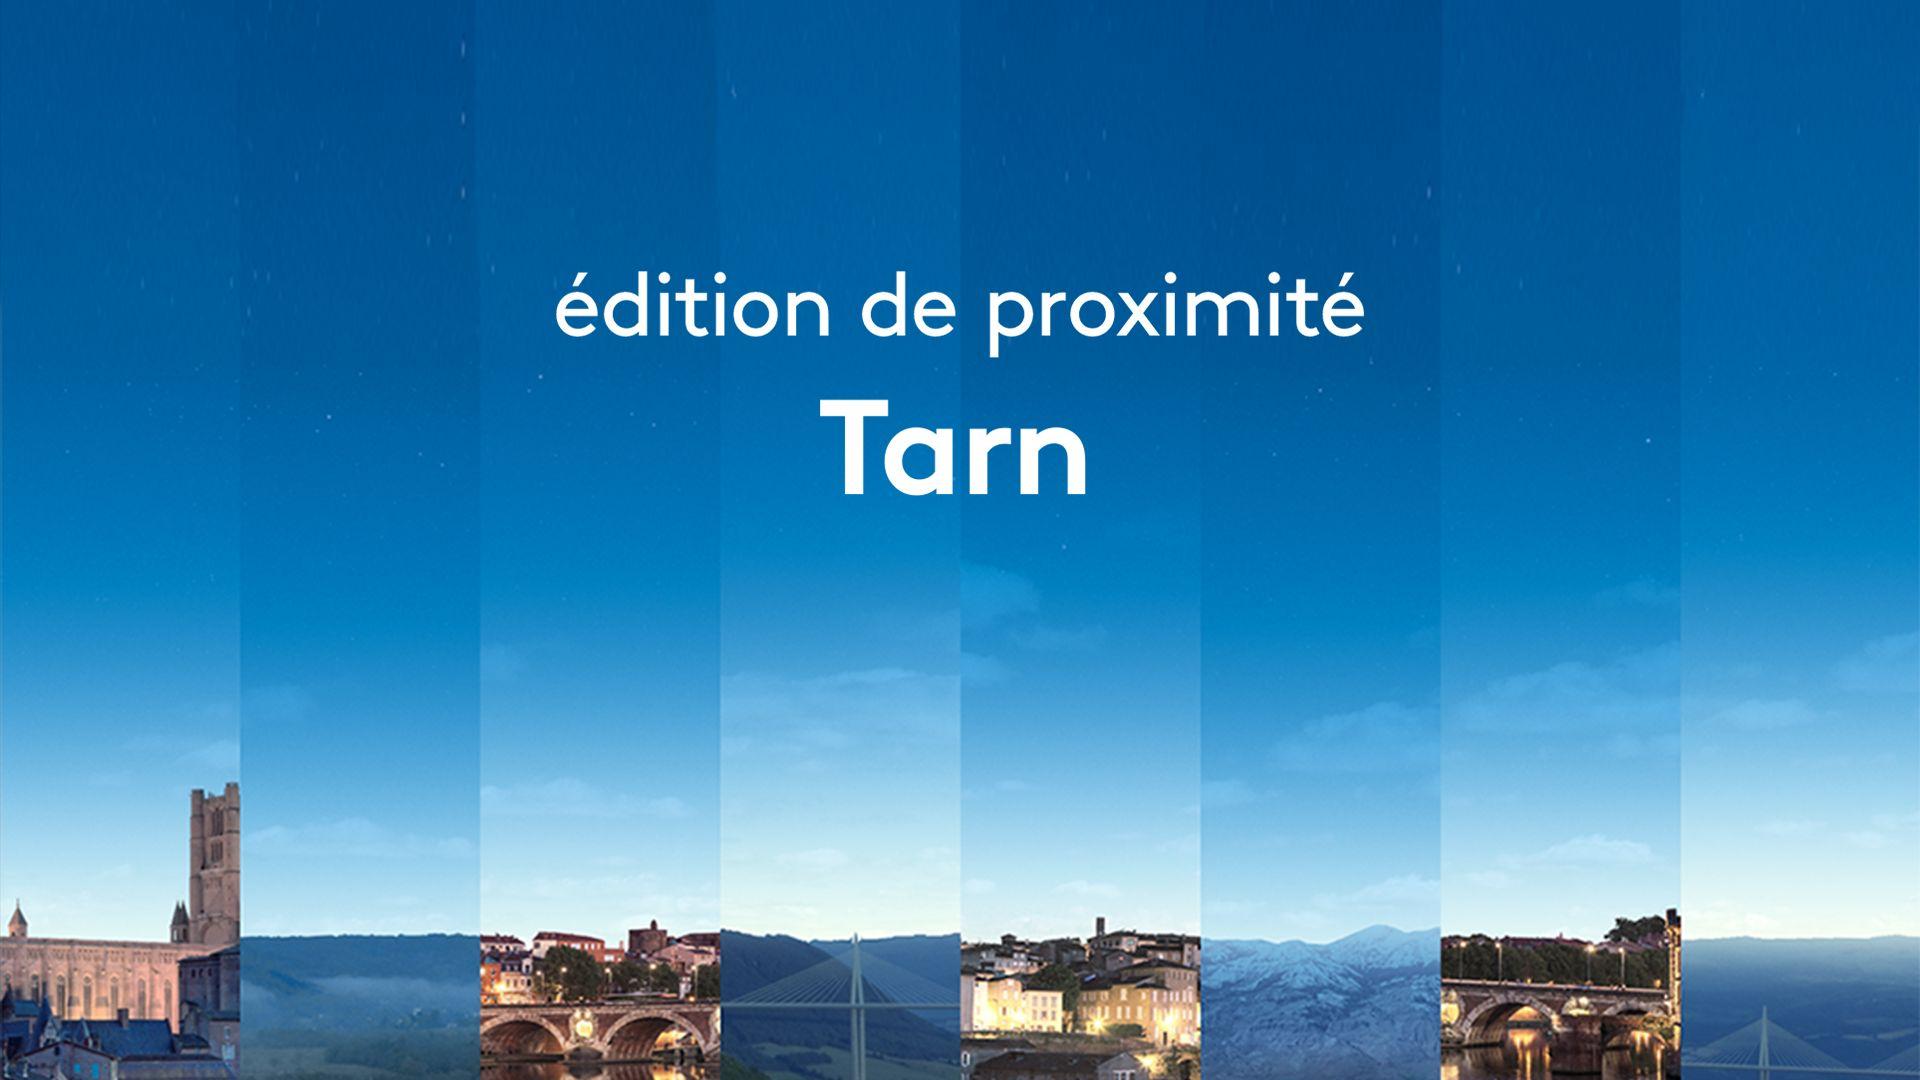 Edition de proximité - Tarn